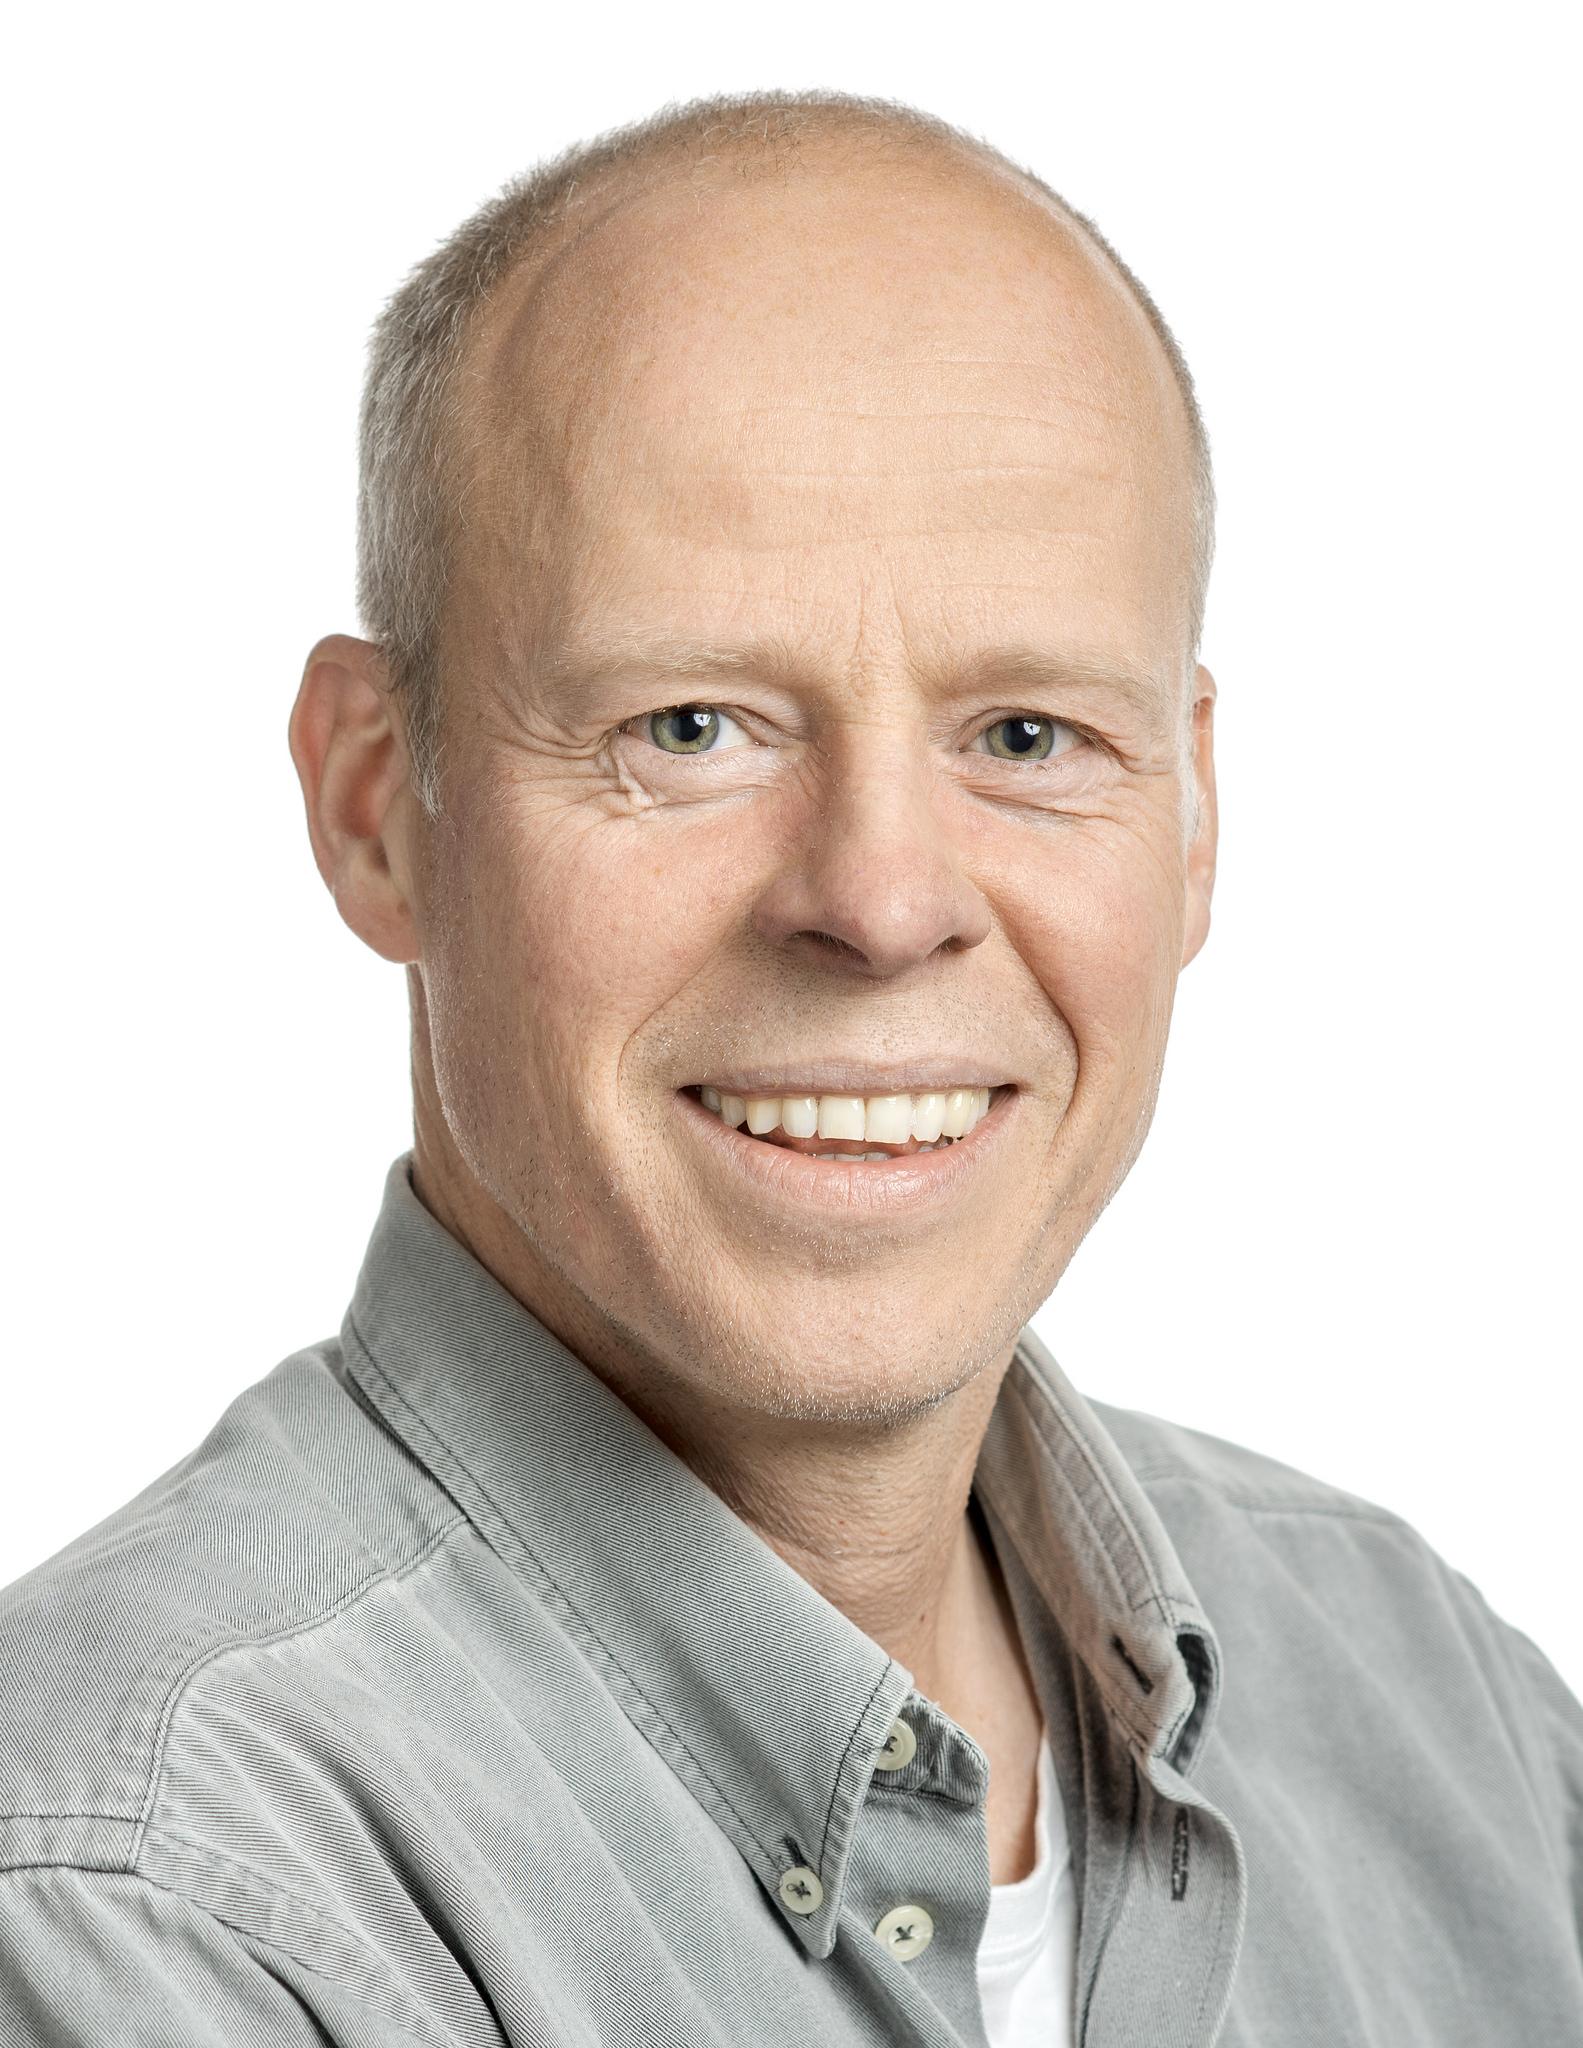 Jonas Löwgren